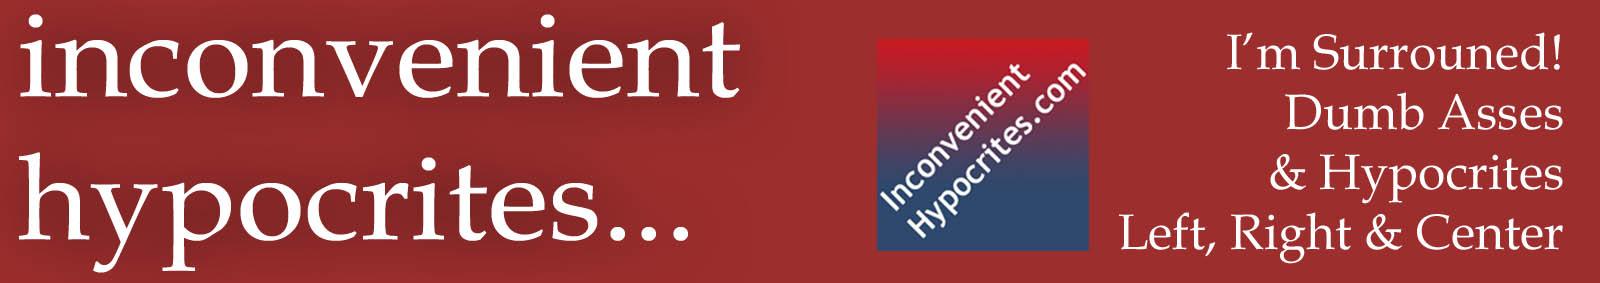 Inconvenient Hypocrites